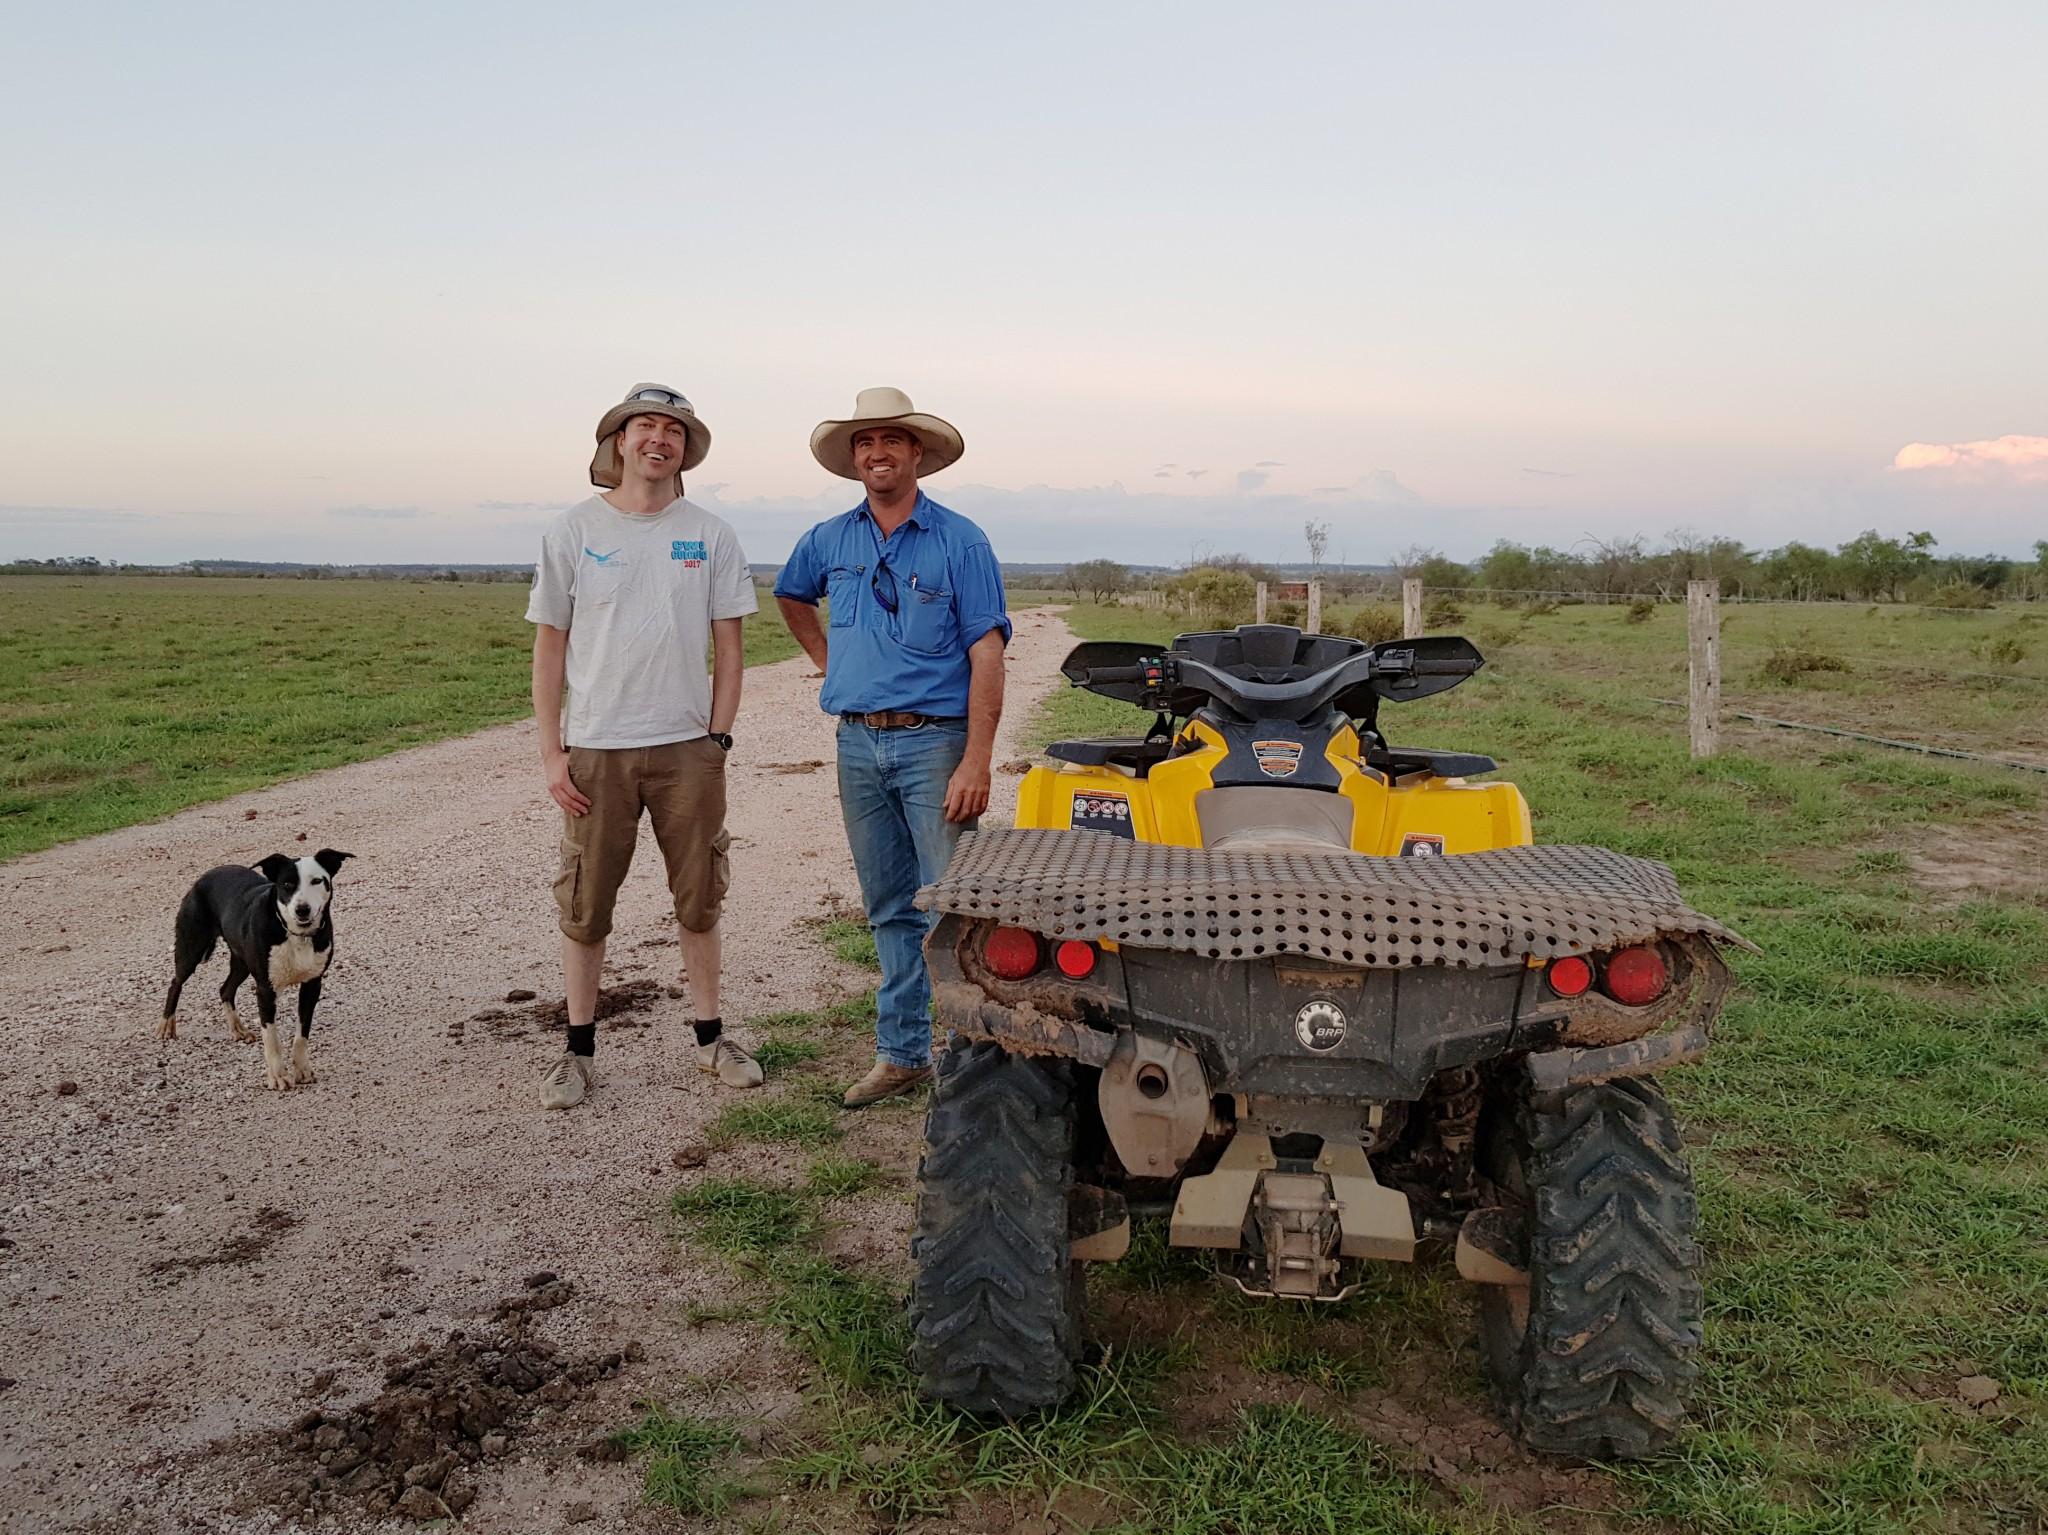 Michael and Matt ~ Миха и местный фермер Мэтт